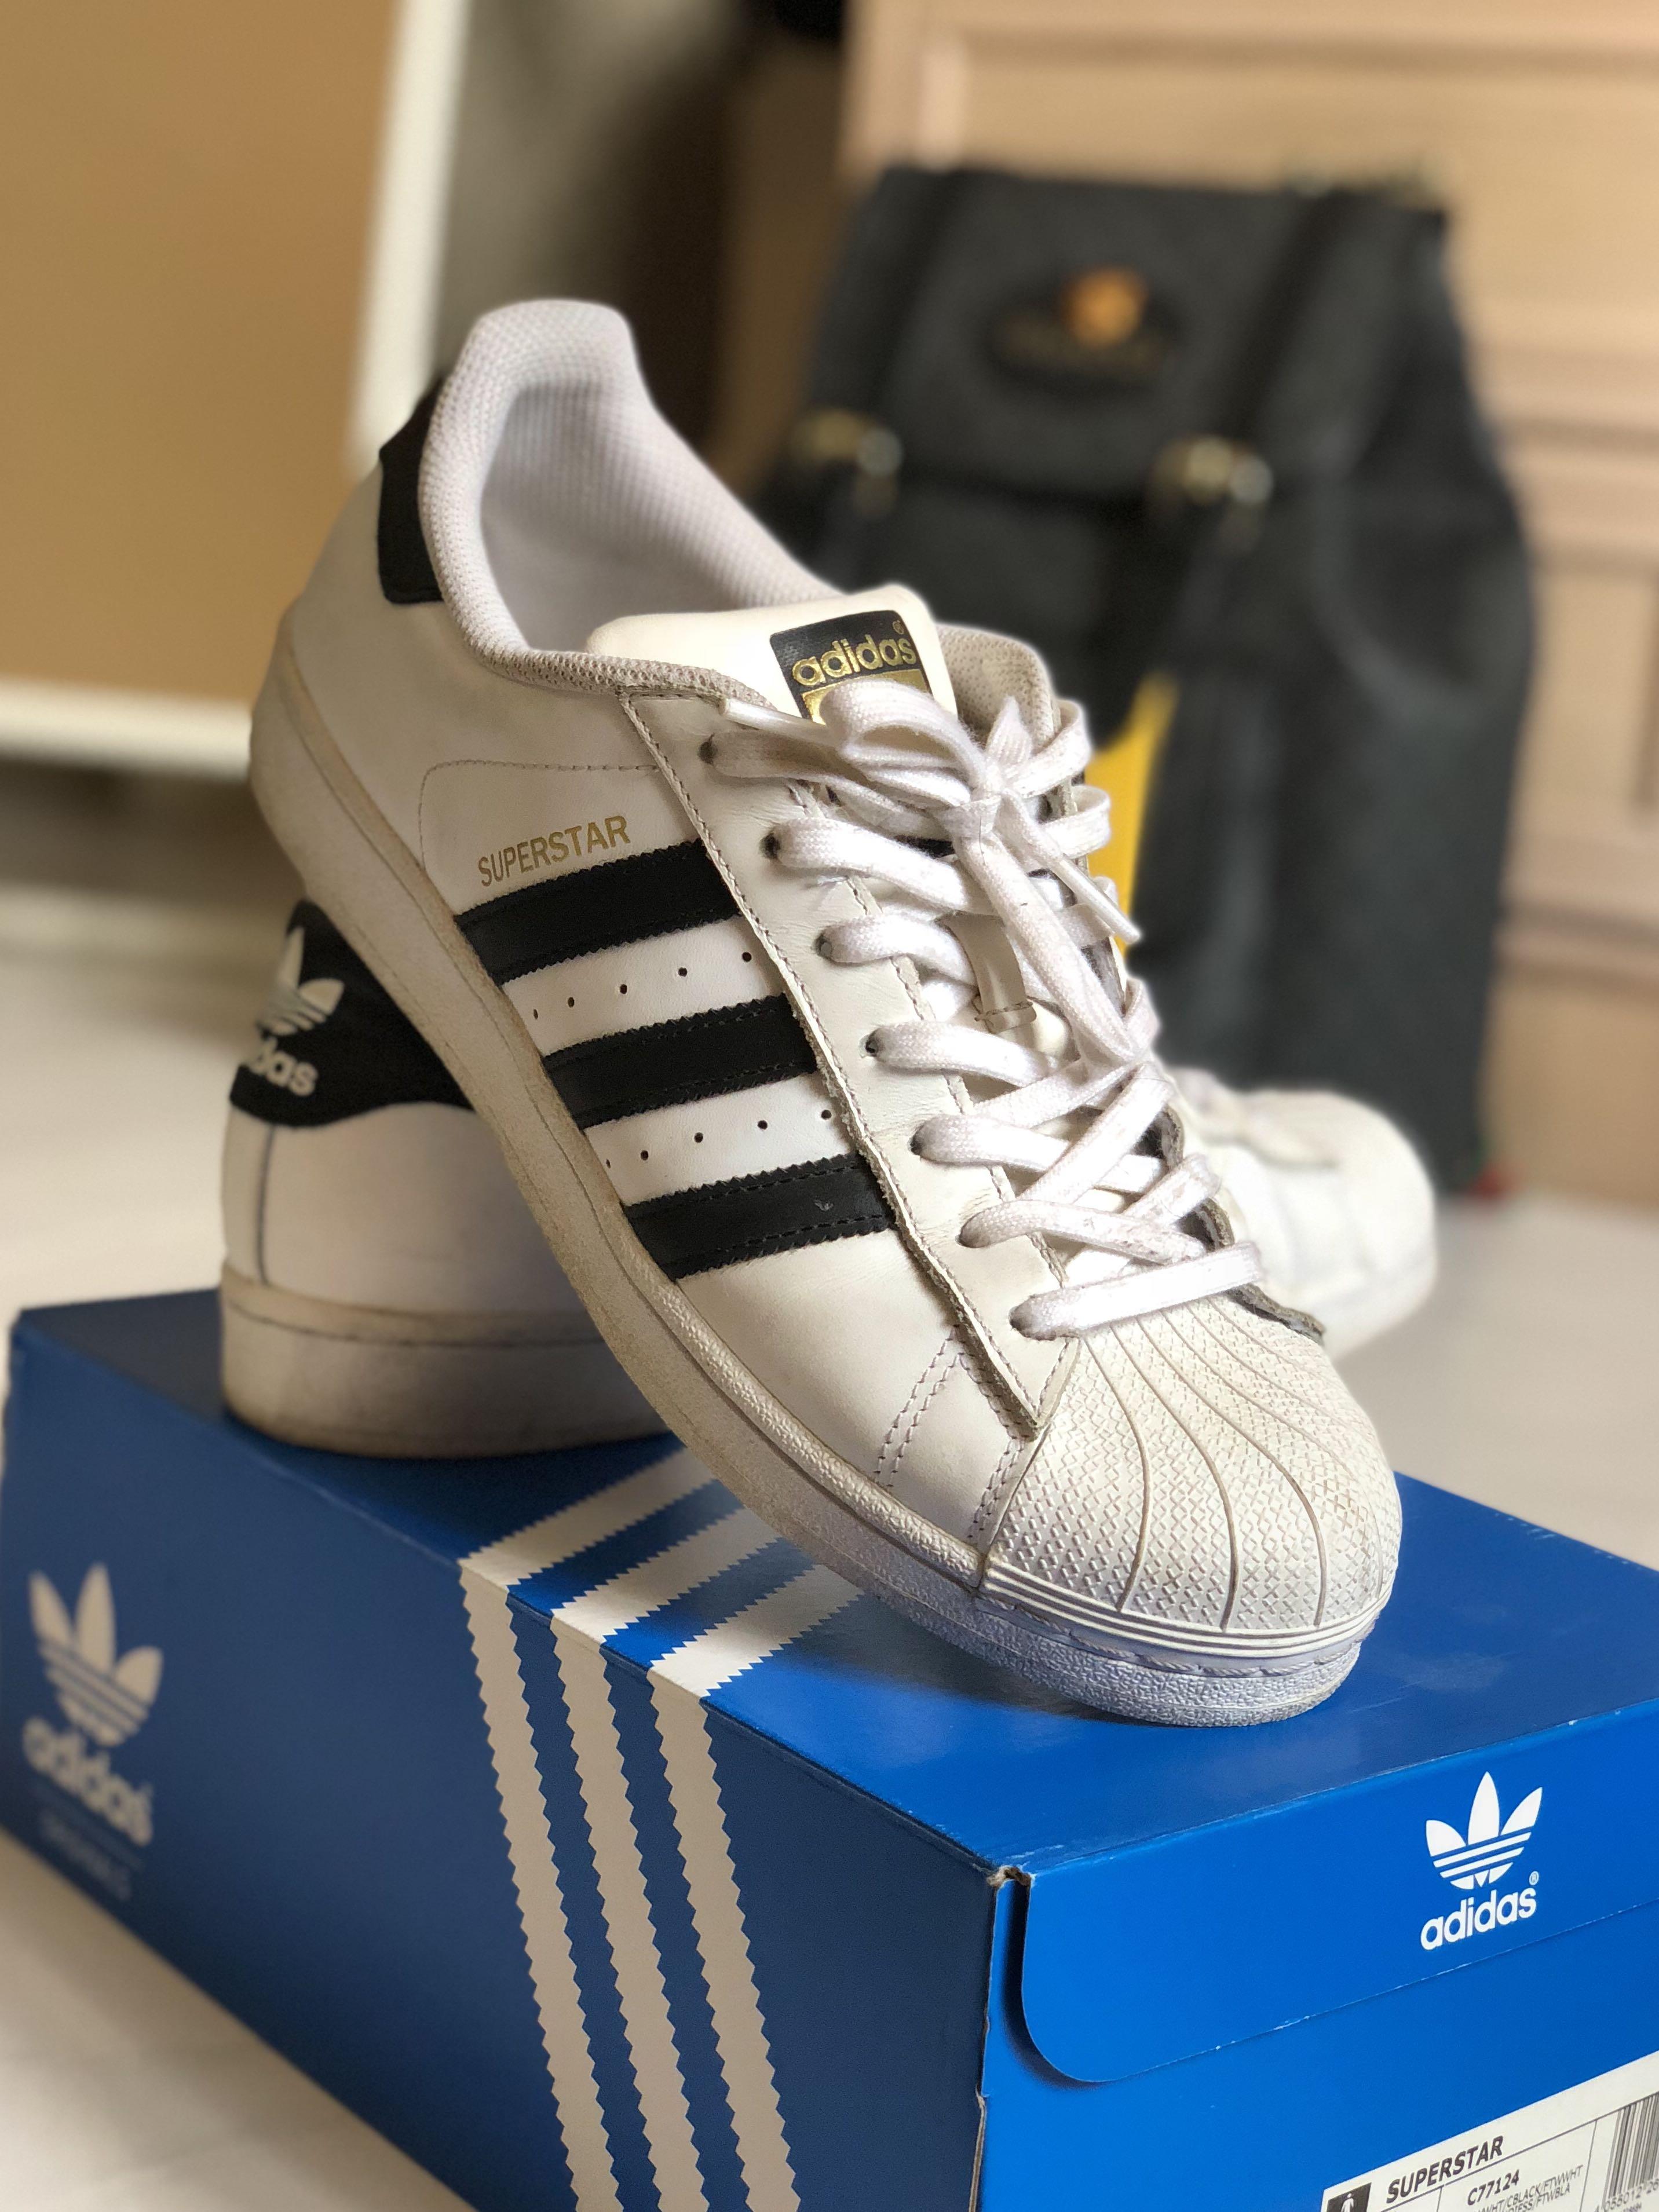 5a0edc436ea3 Adidas Superstar Shoes